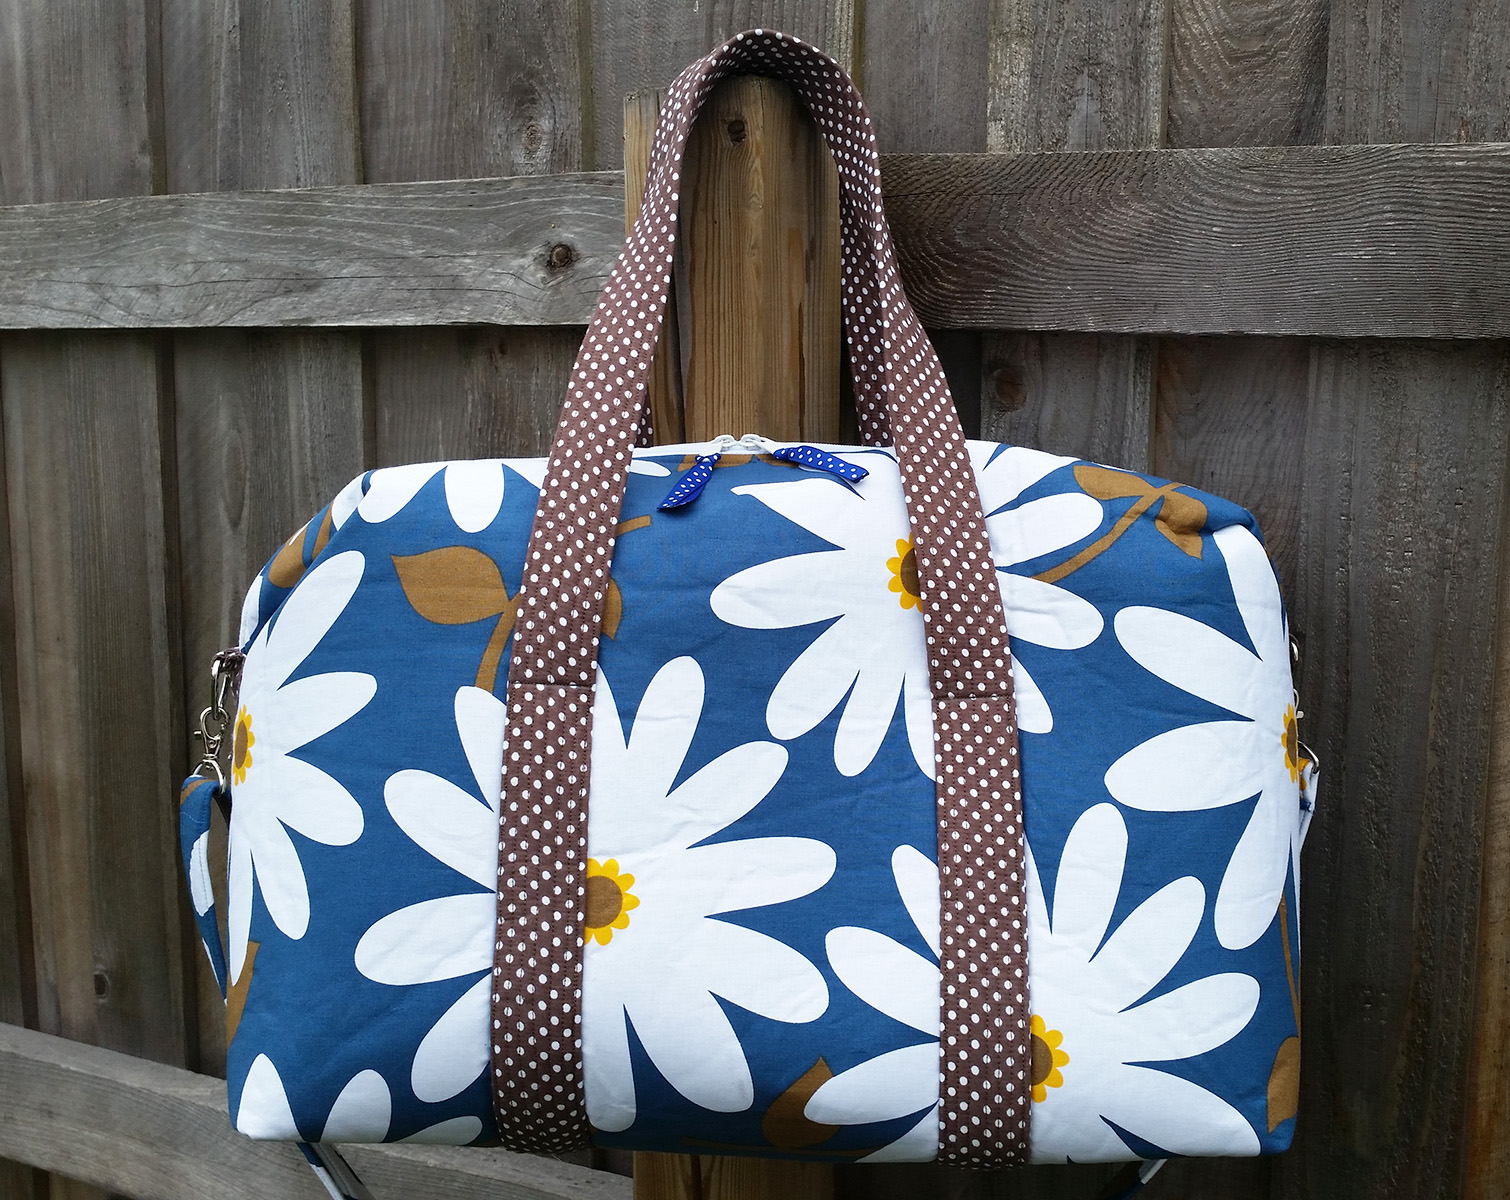 Sew Sweetness Emblem Duffle Bag, sewn by Teresa